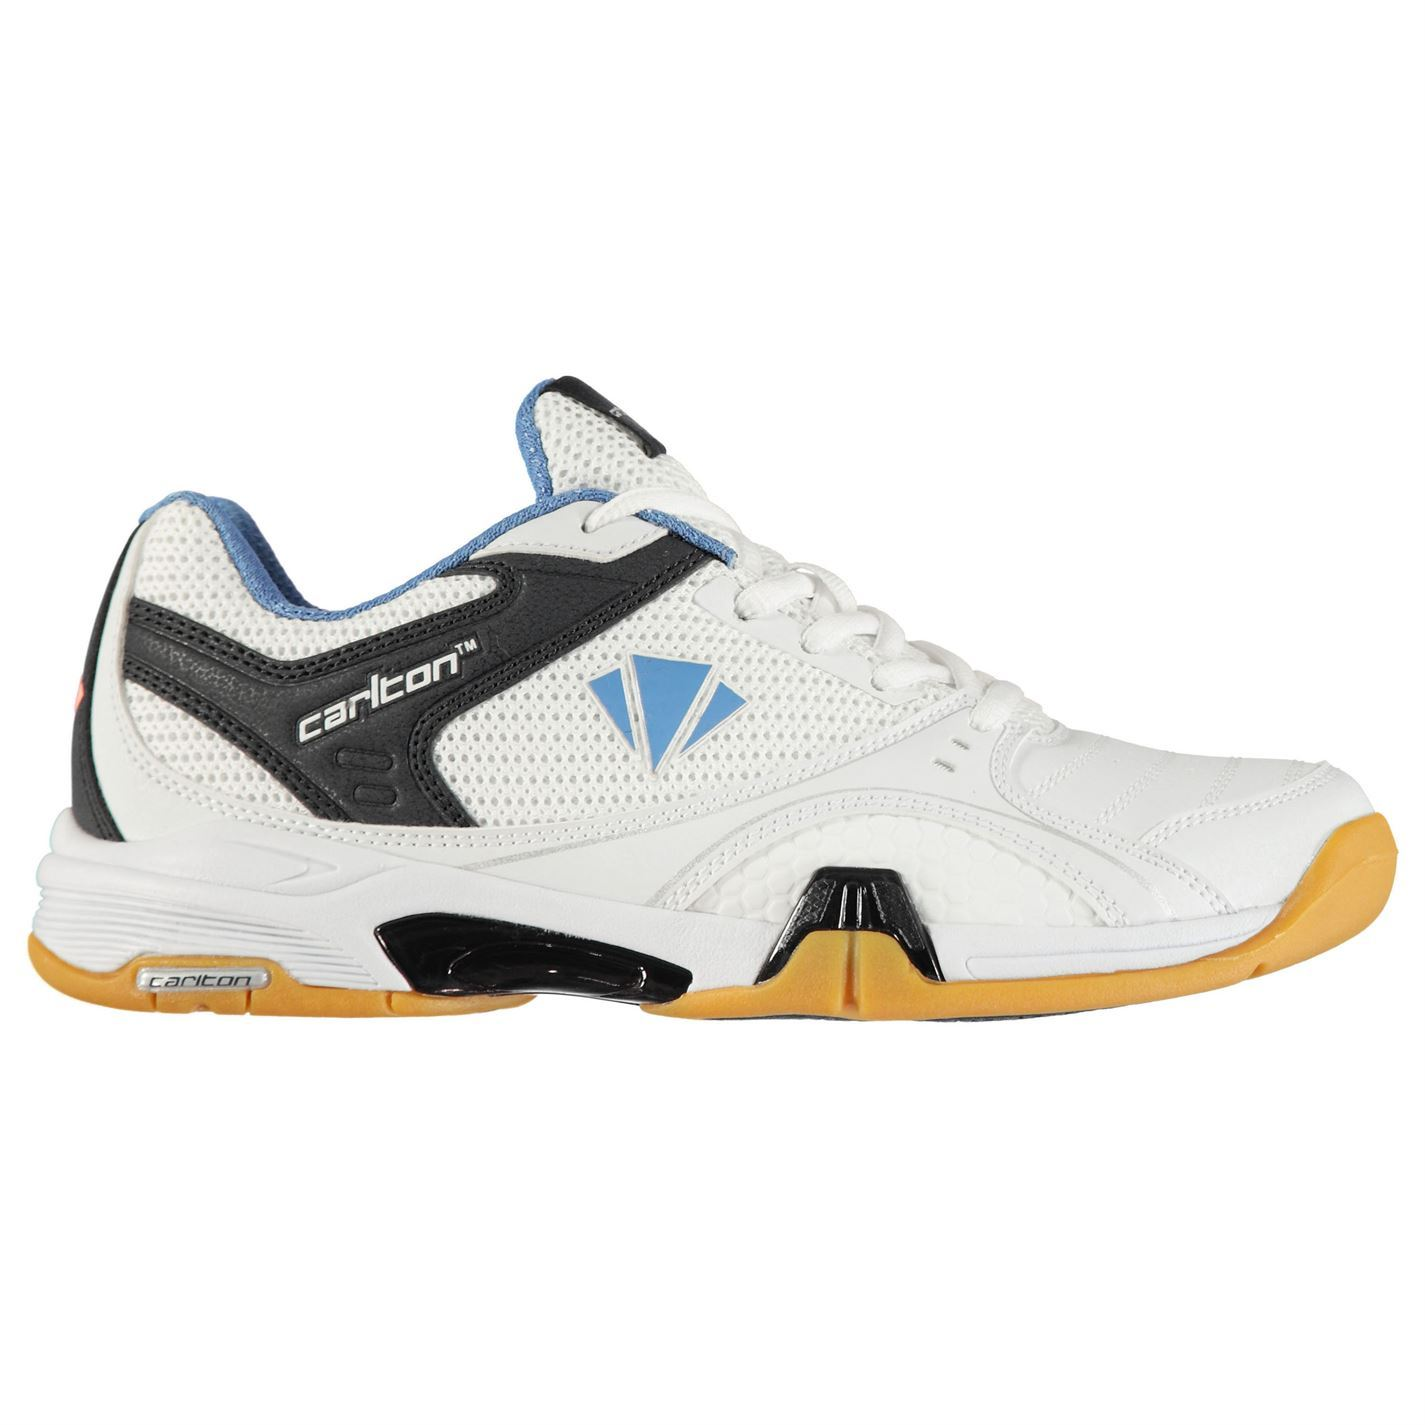 774ad0104c8f Carlton Womens Airblade Lite Ladies Badminton Sports Shoes Trainers ...